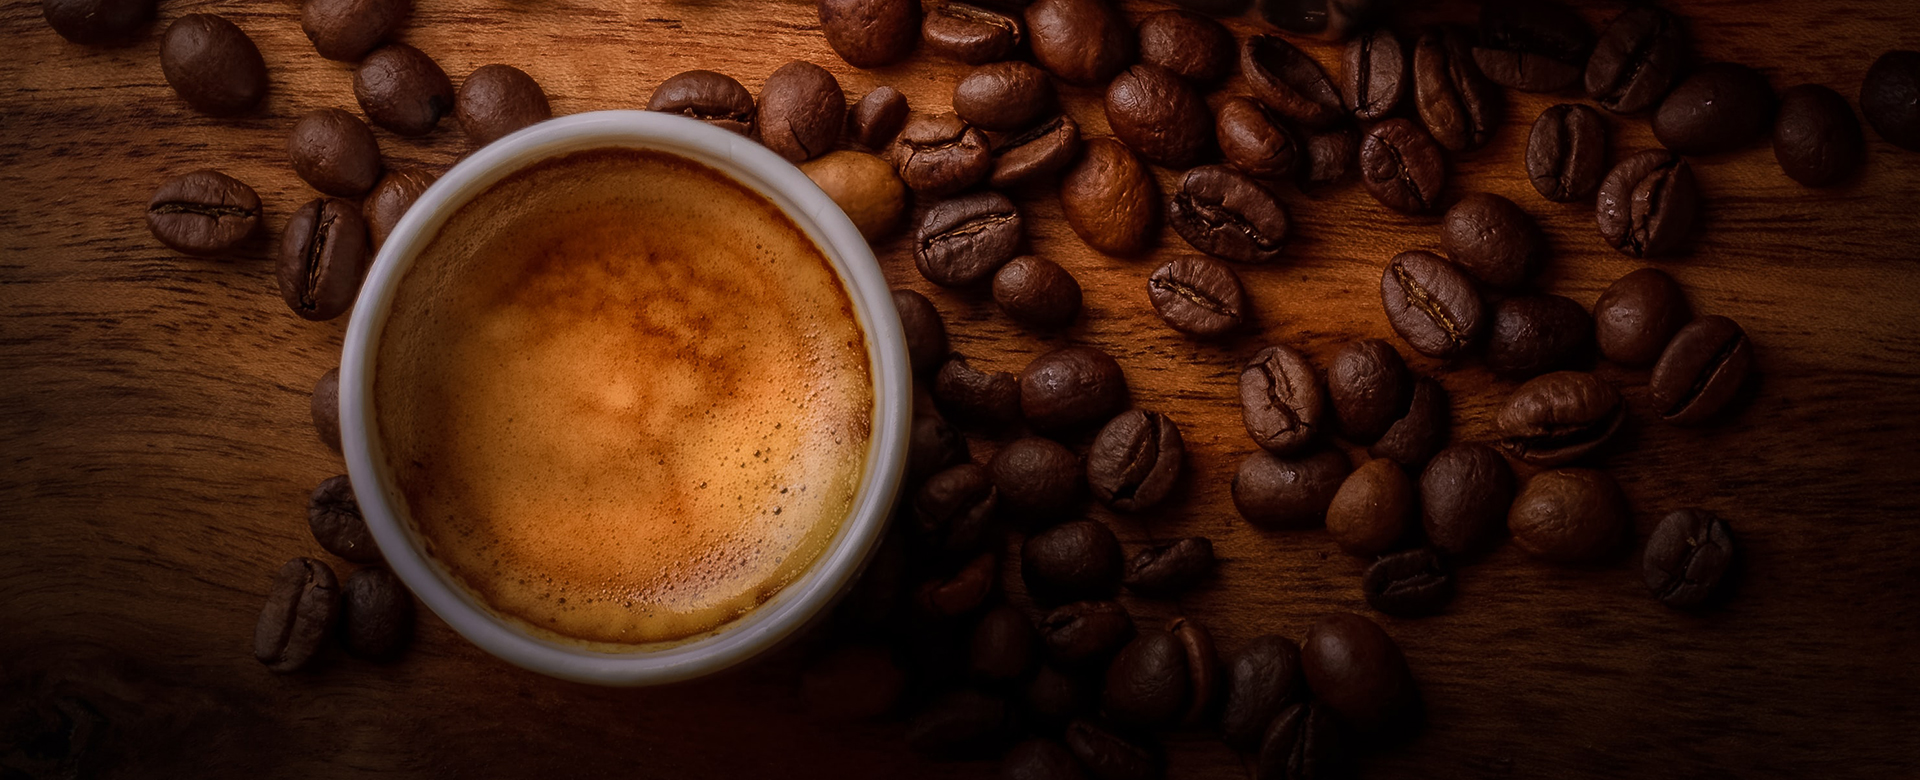 sky-coffee-101.jpg